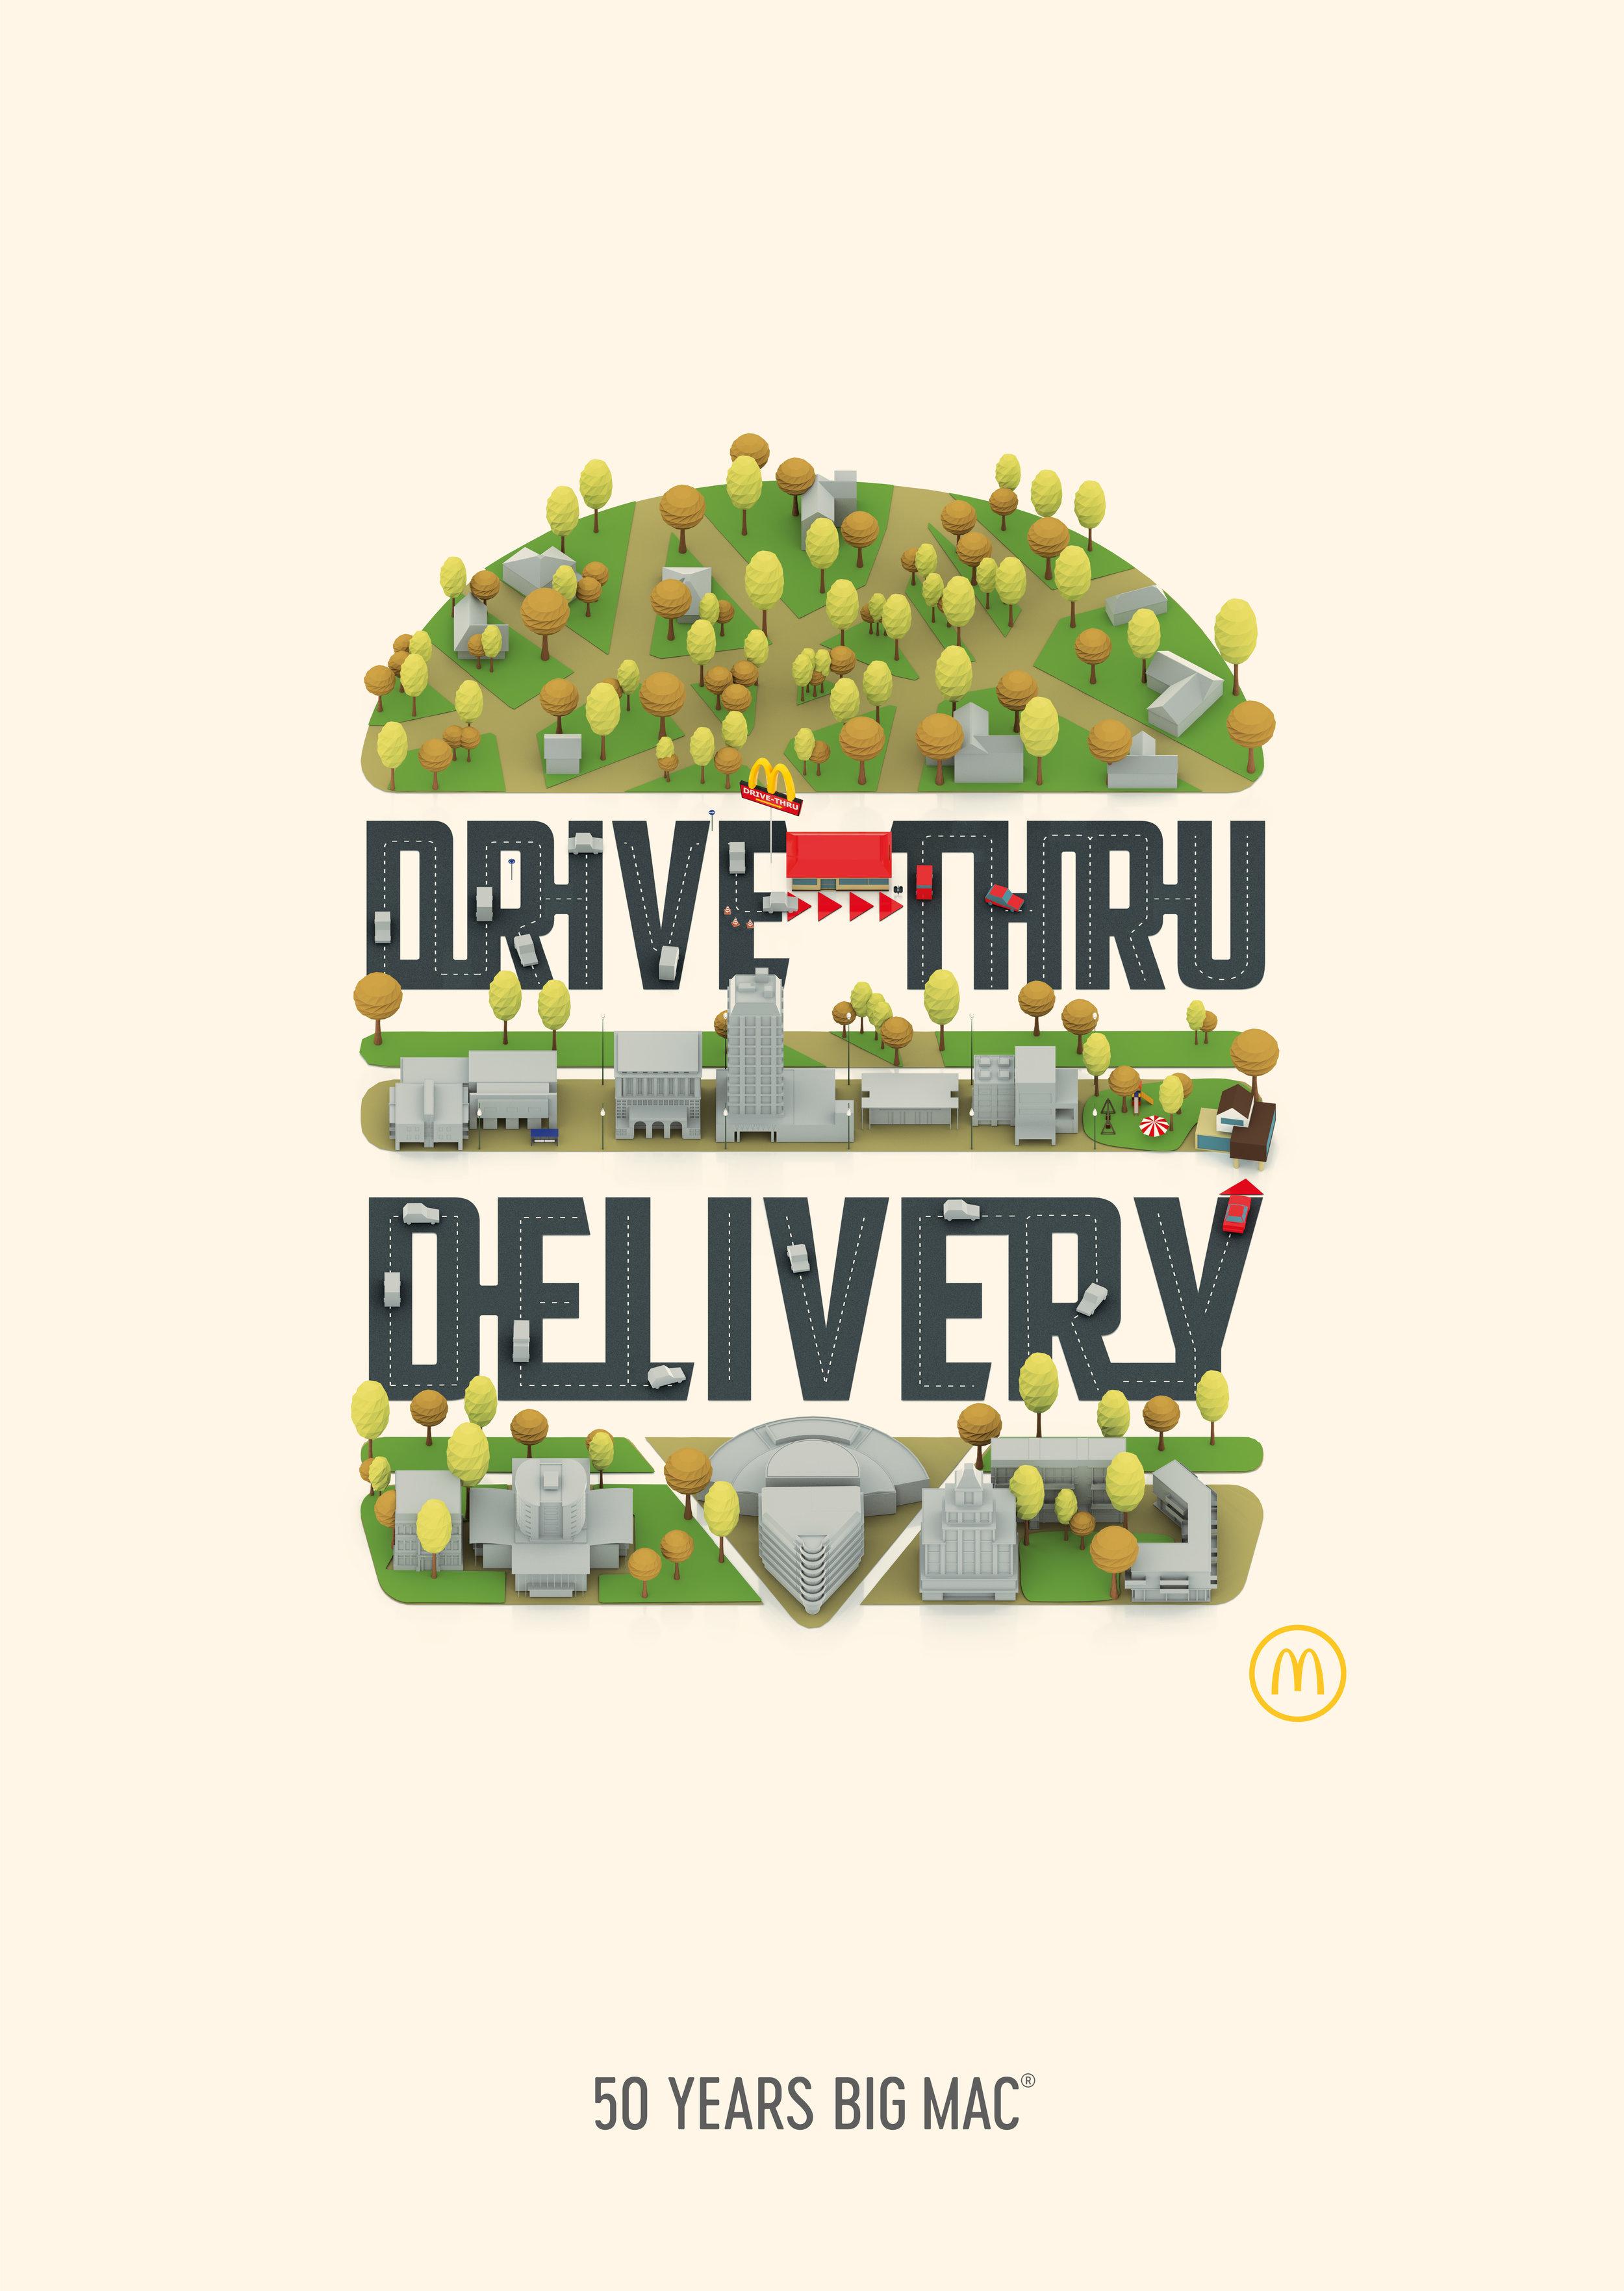 16_Drive-Thru:Delivery.jpg